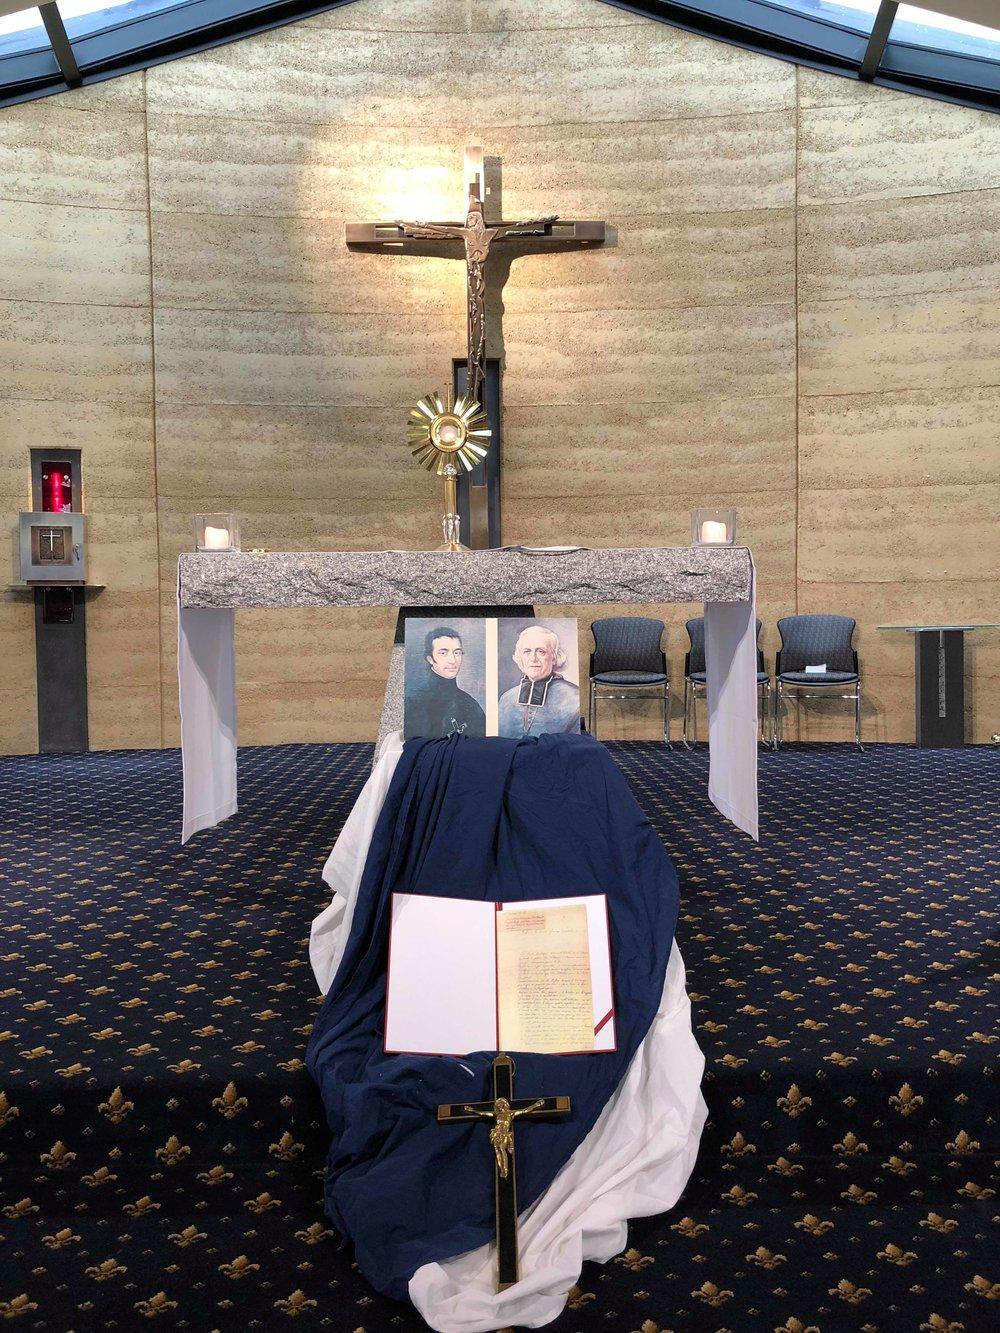 Chapel display at Mazenod College VIC